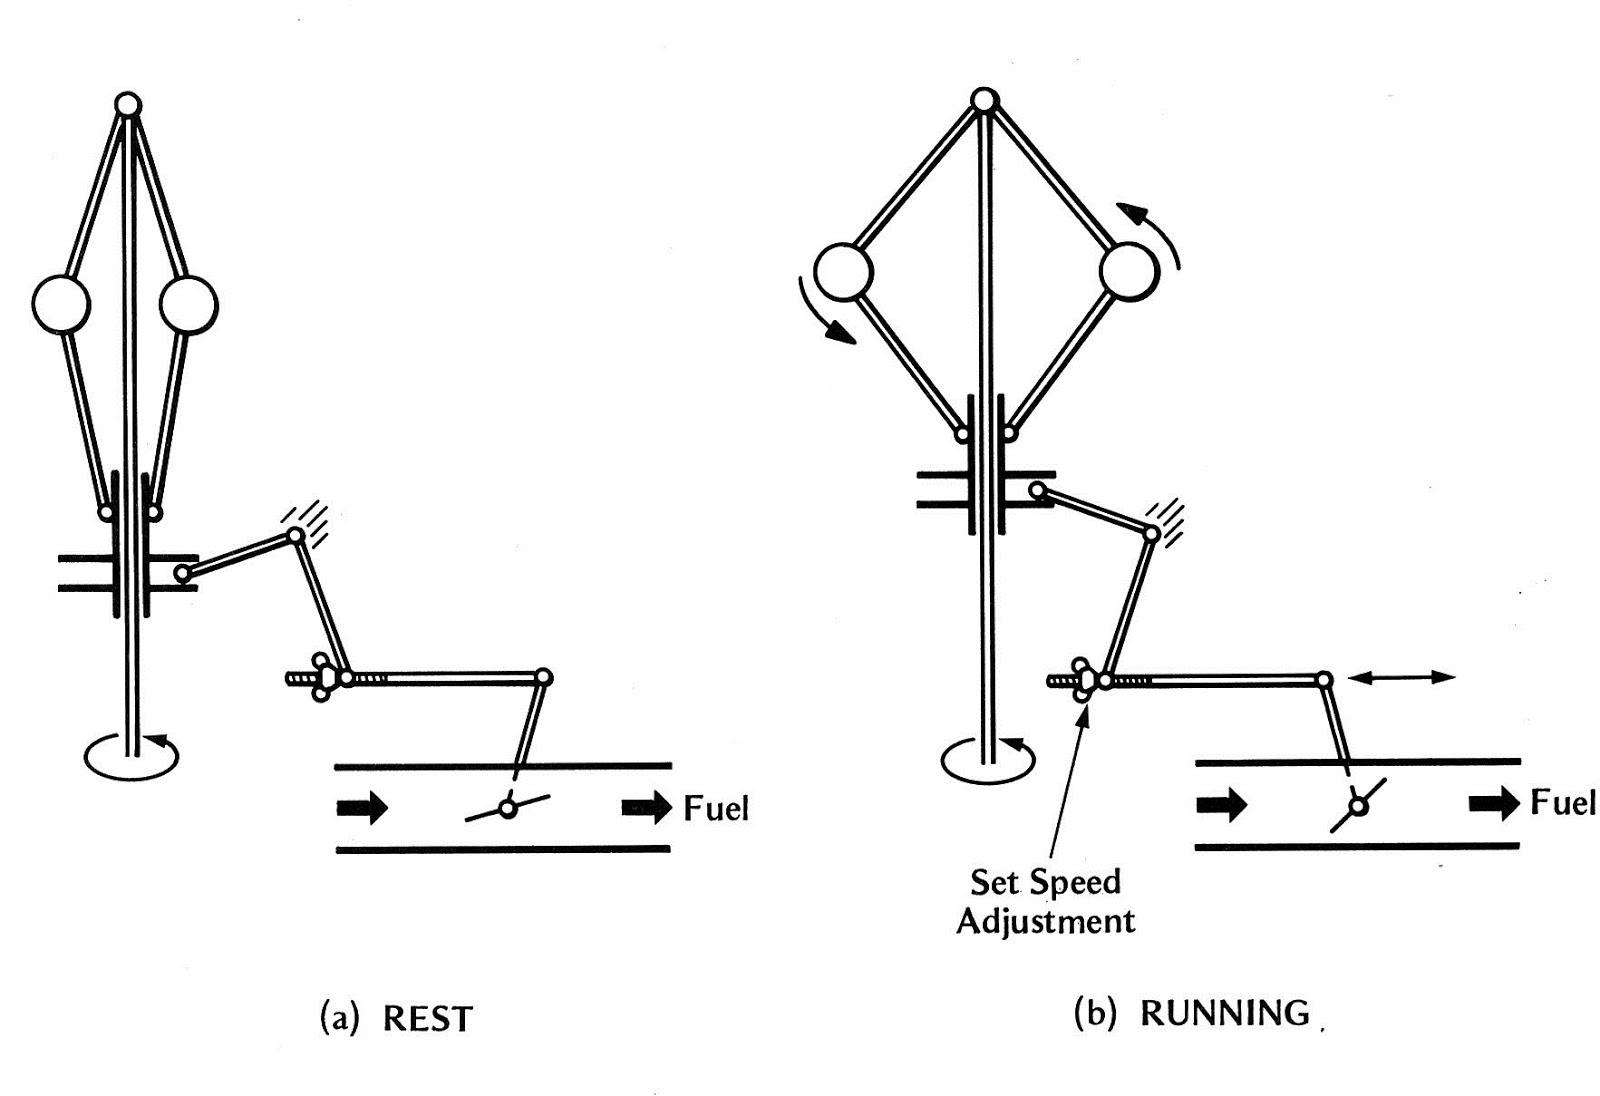 hight resolution of for a 2000 pontiac grand prix se fuse box diagram 2006 chevy equinox serpentine belt